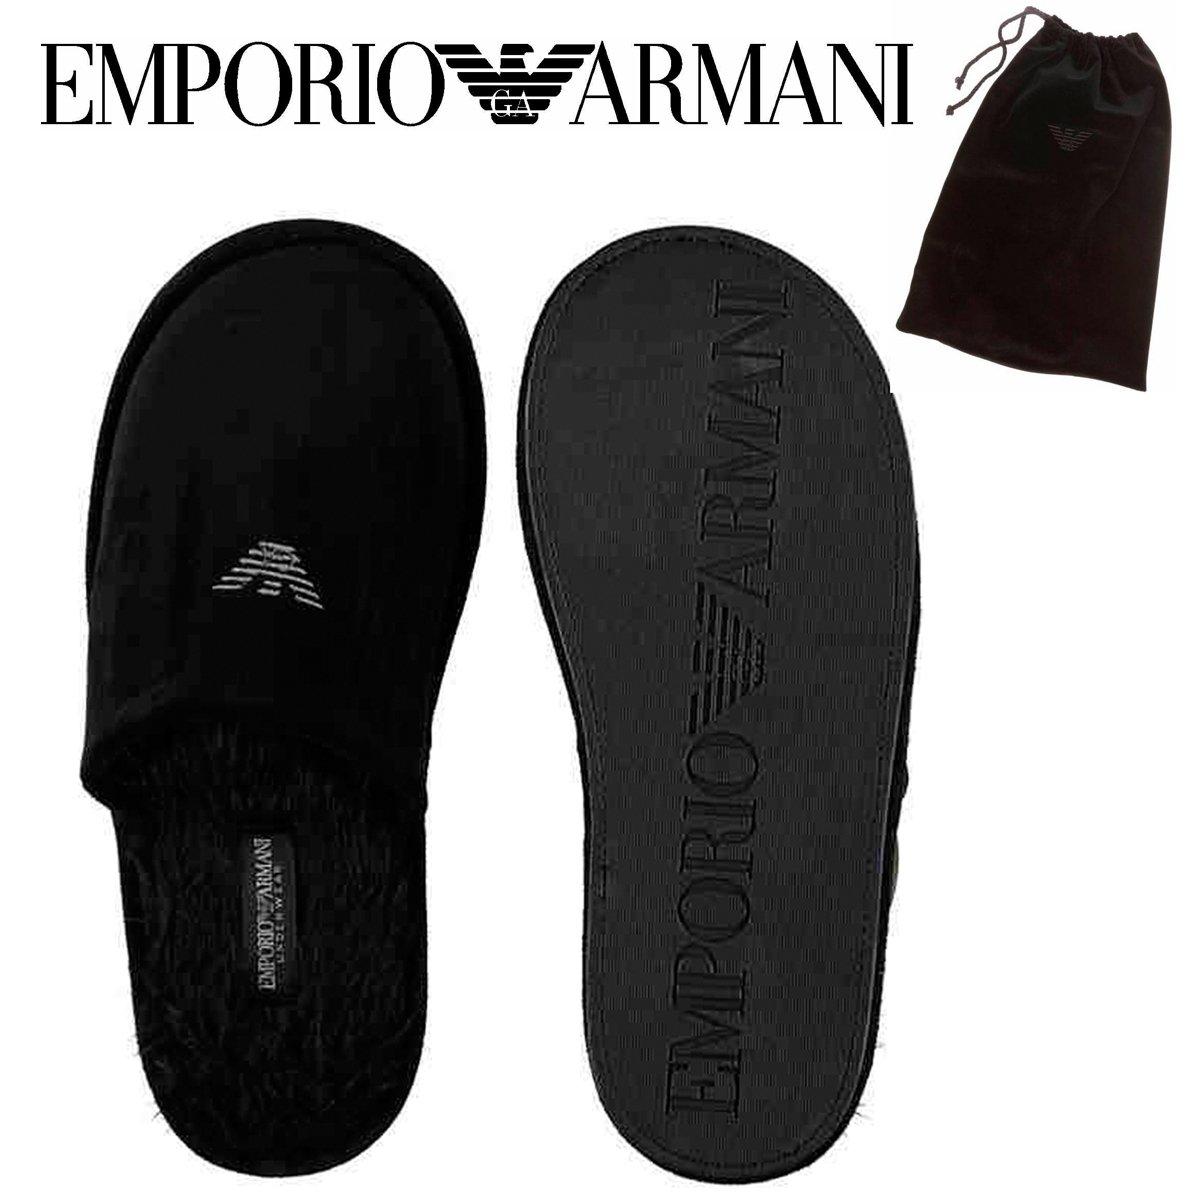 17046fd9360e EMPORIO ARMANI UNDERWEAR Black VELVET Velour Eagle Logo Men s Mules Winter  Fur Slippers Warm Authenticity Certificate UK 13-14 SALE